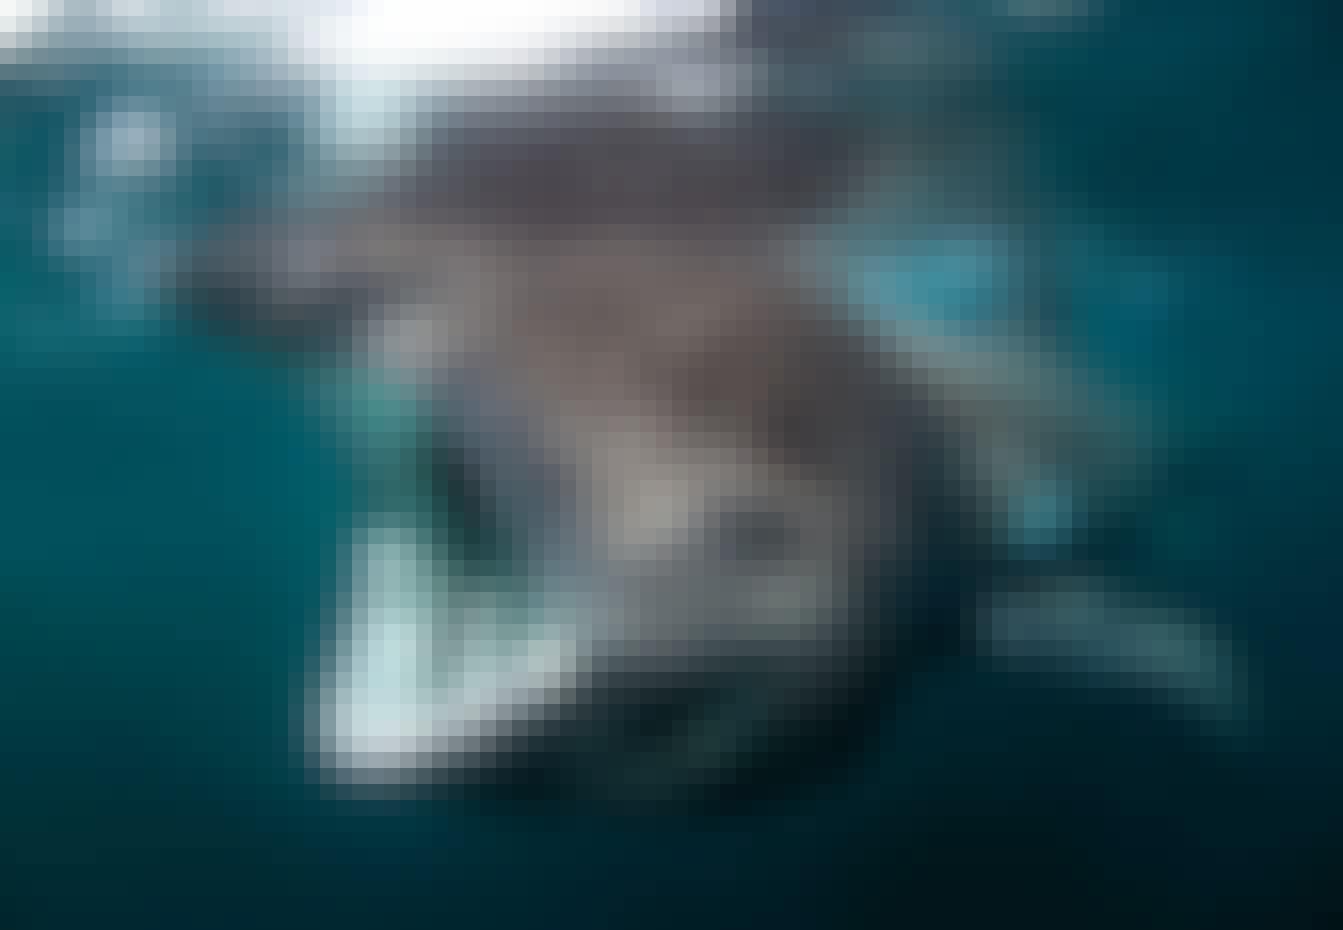 Hajar i Europa - brugd